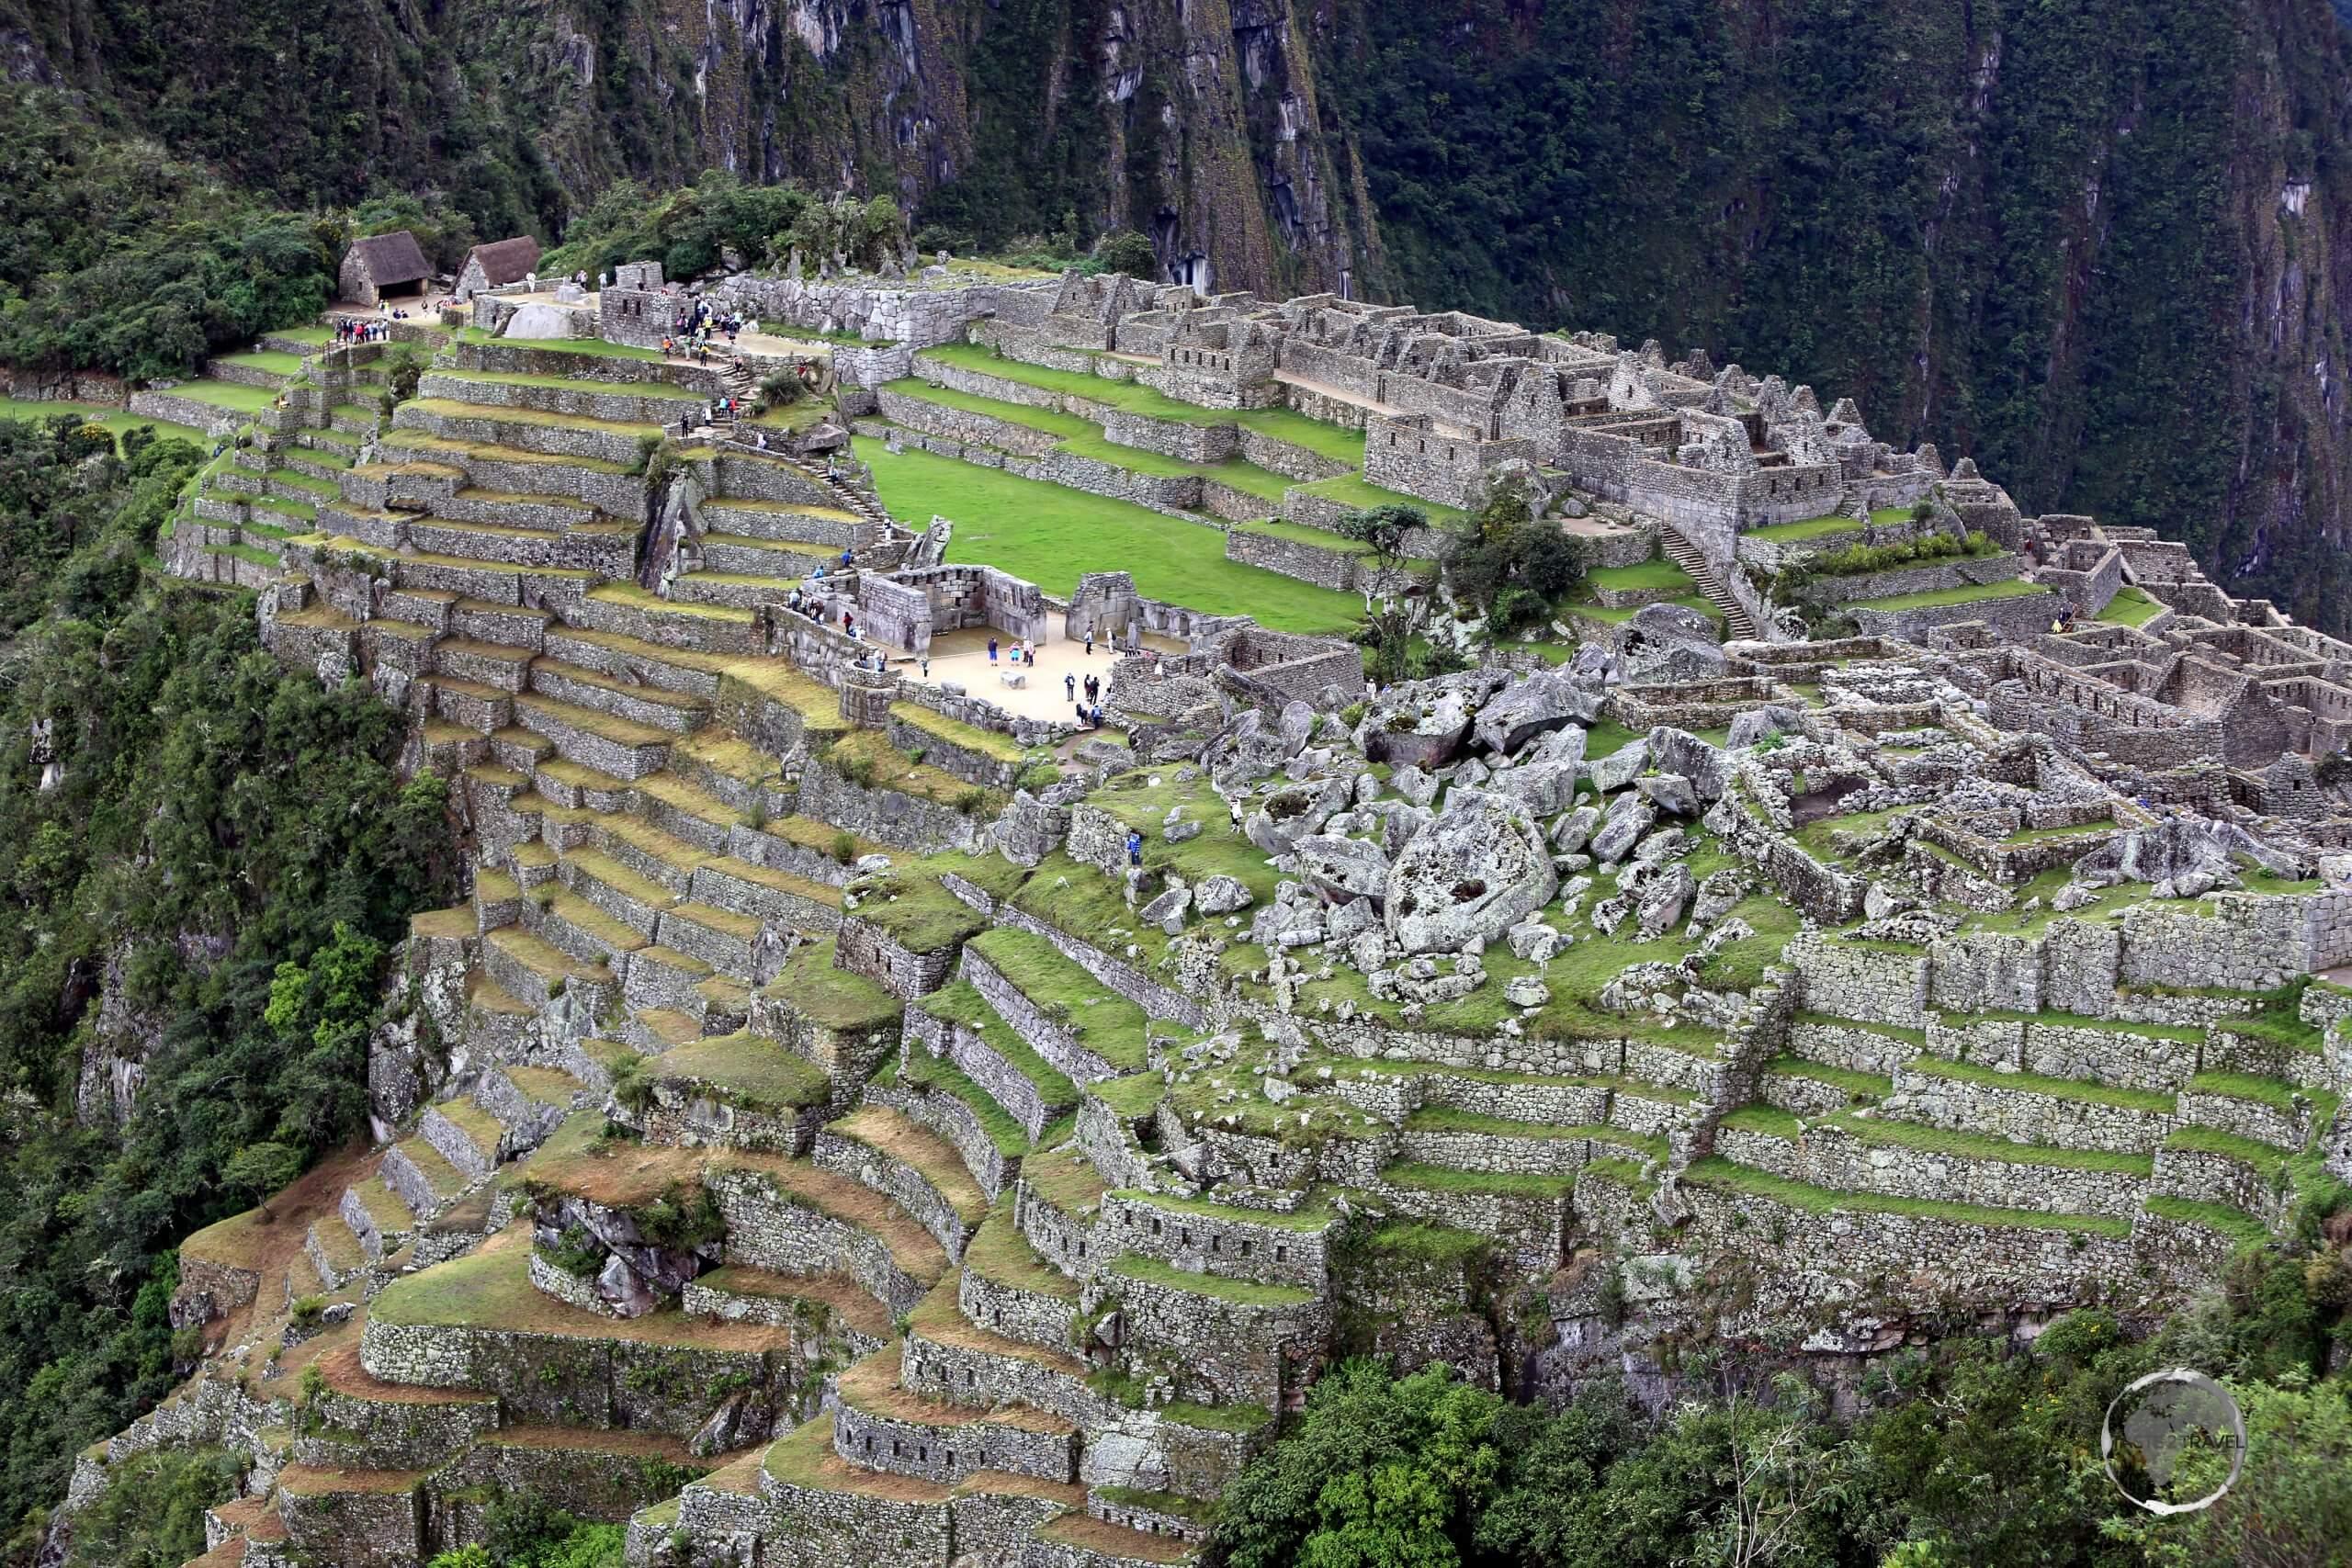 A view of Machu Picchu, a 15th-century Inca citadel, located in the Eastern Cordillera of southern Peru, on a 2,430-metre (7,970 ft) mountain ridge.